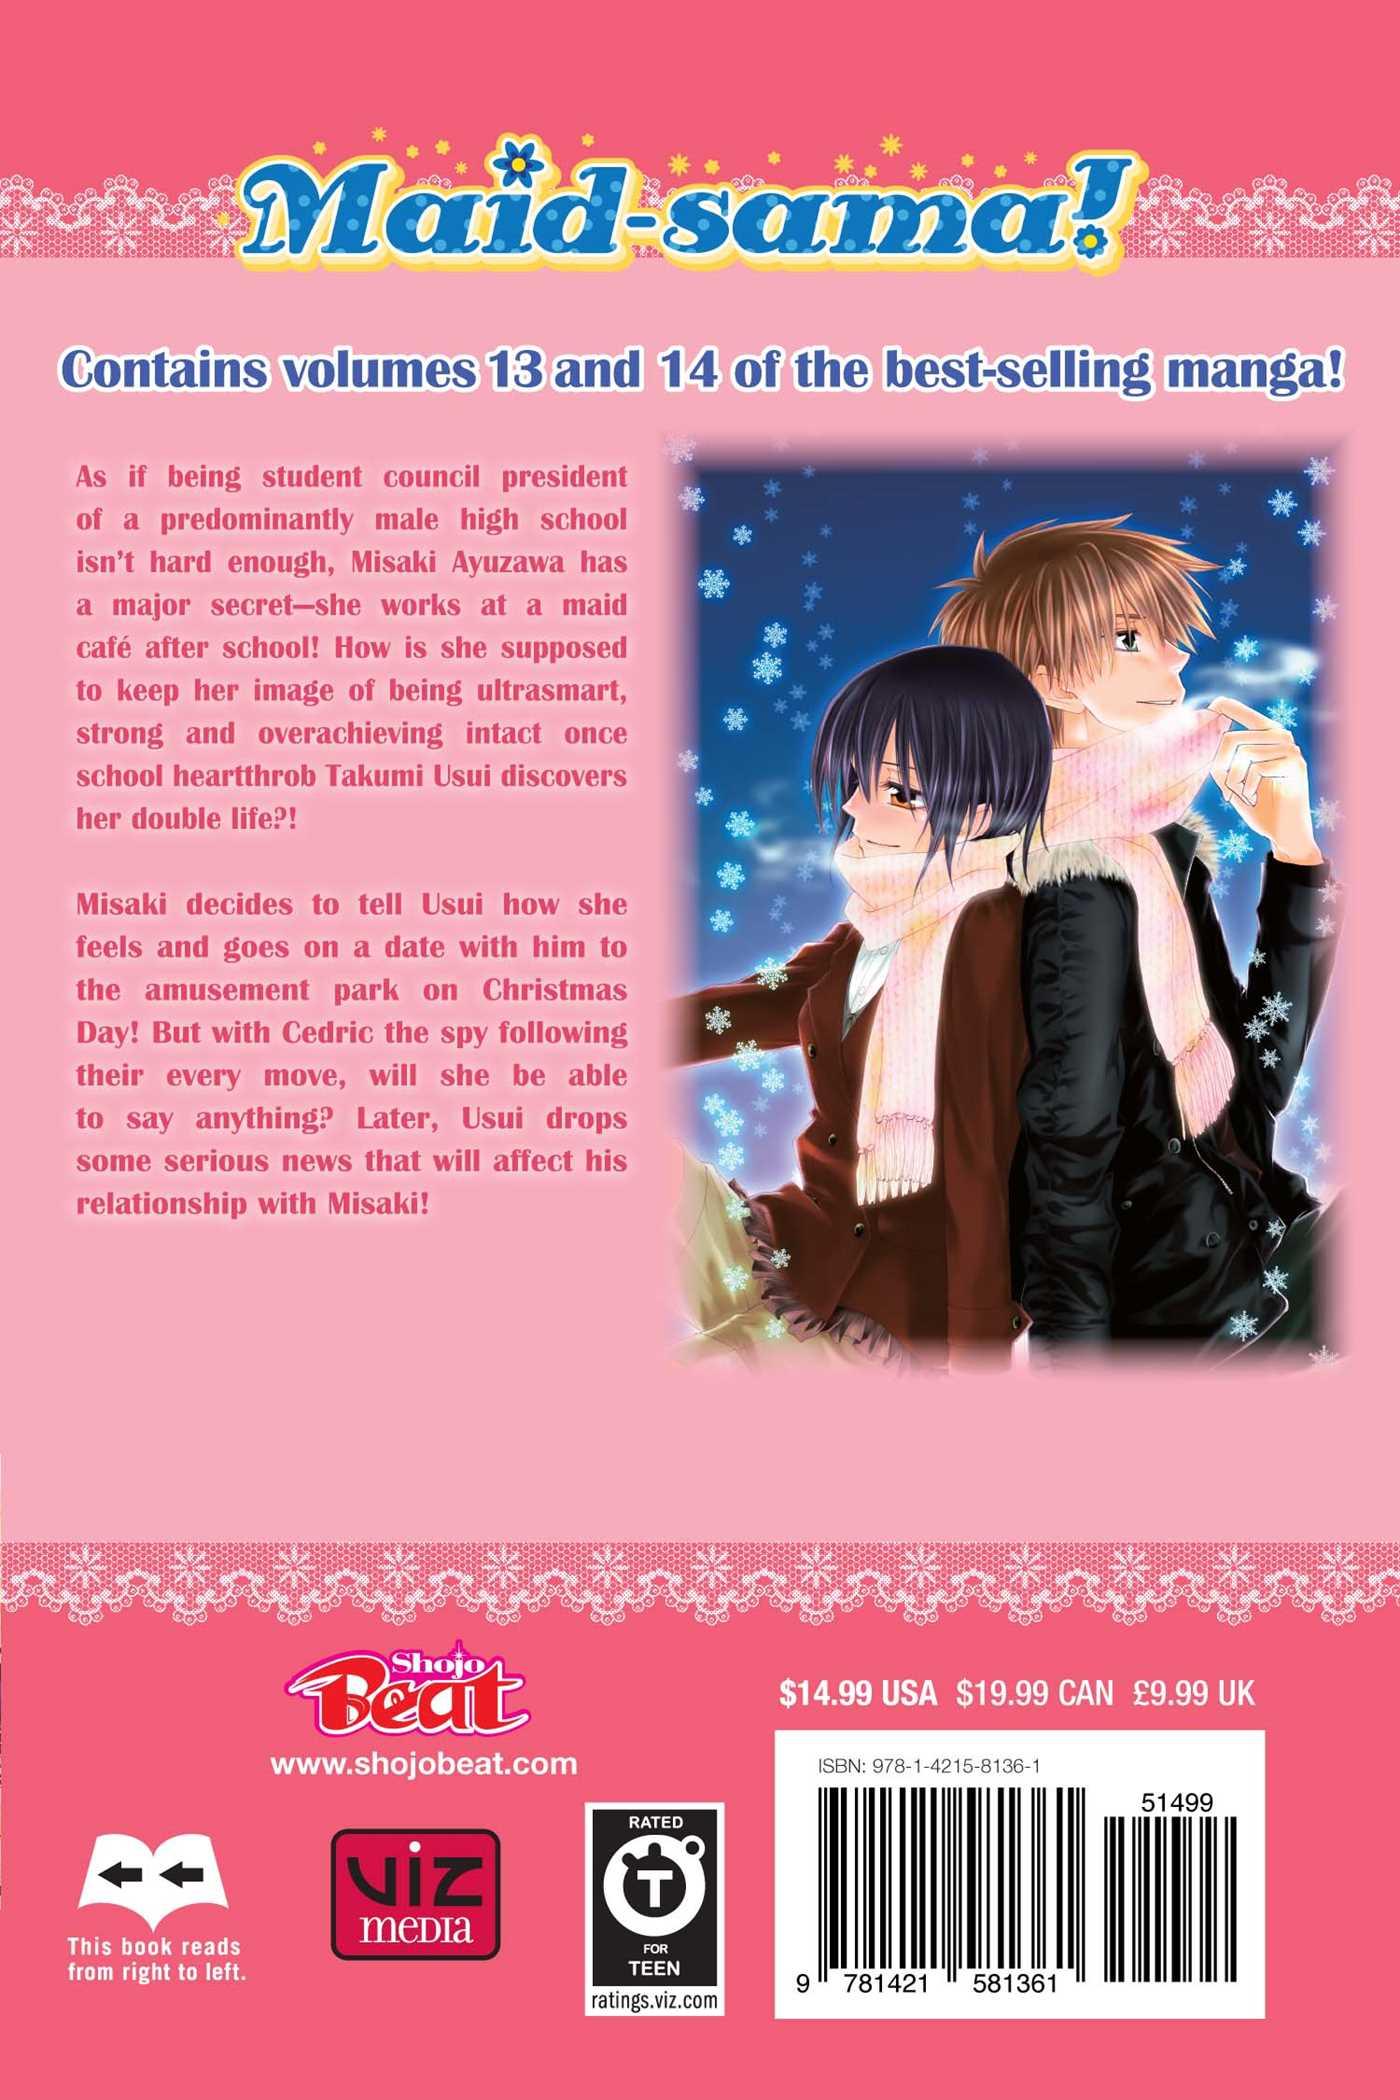 Maid-sama! 2 in 1 Edition Manga Volume 7